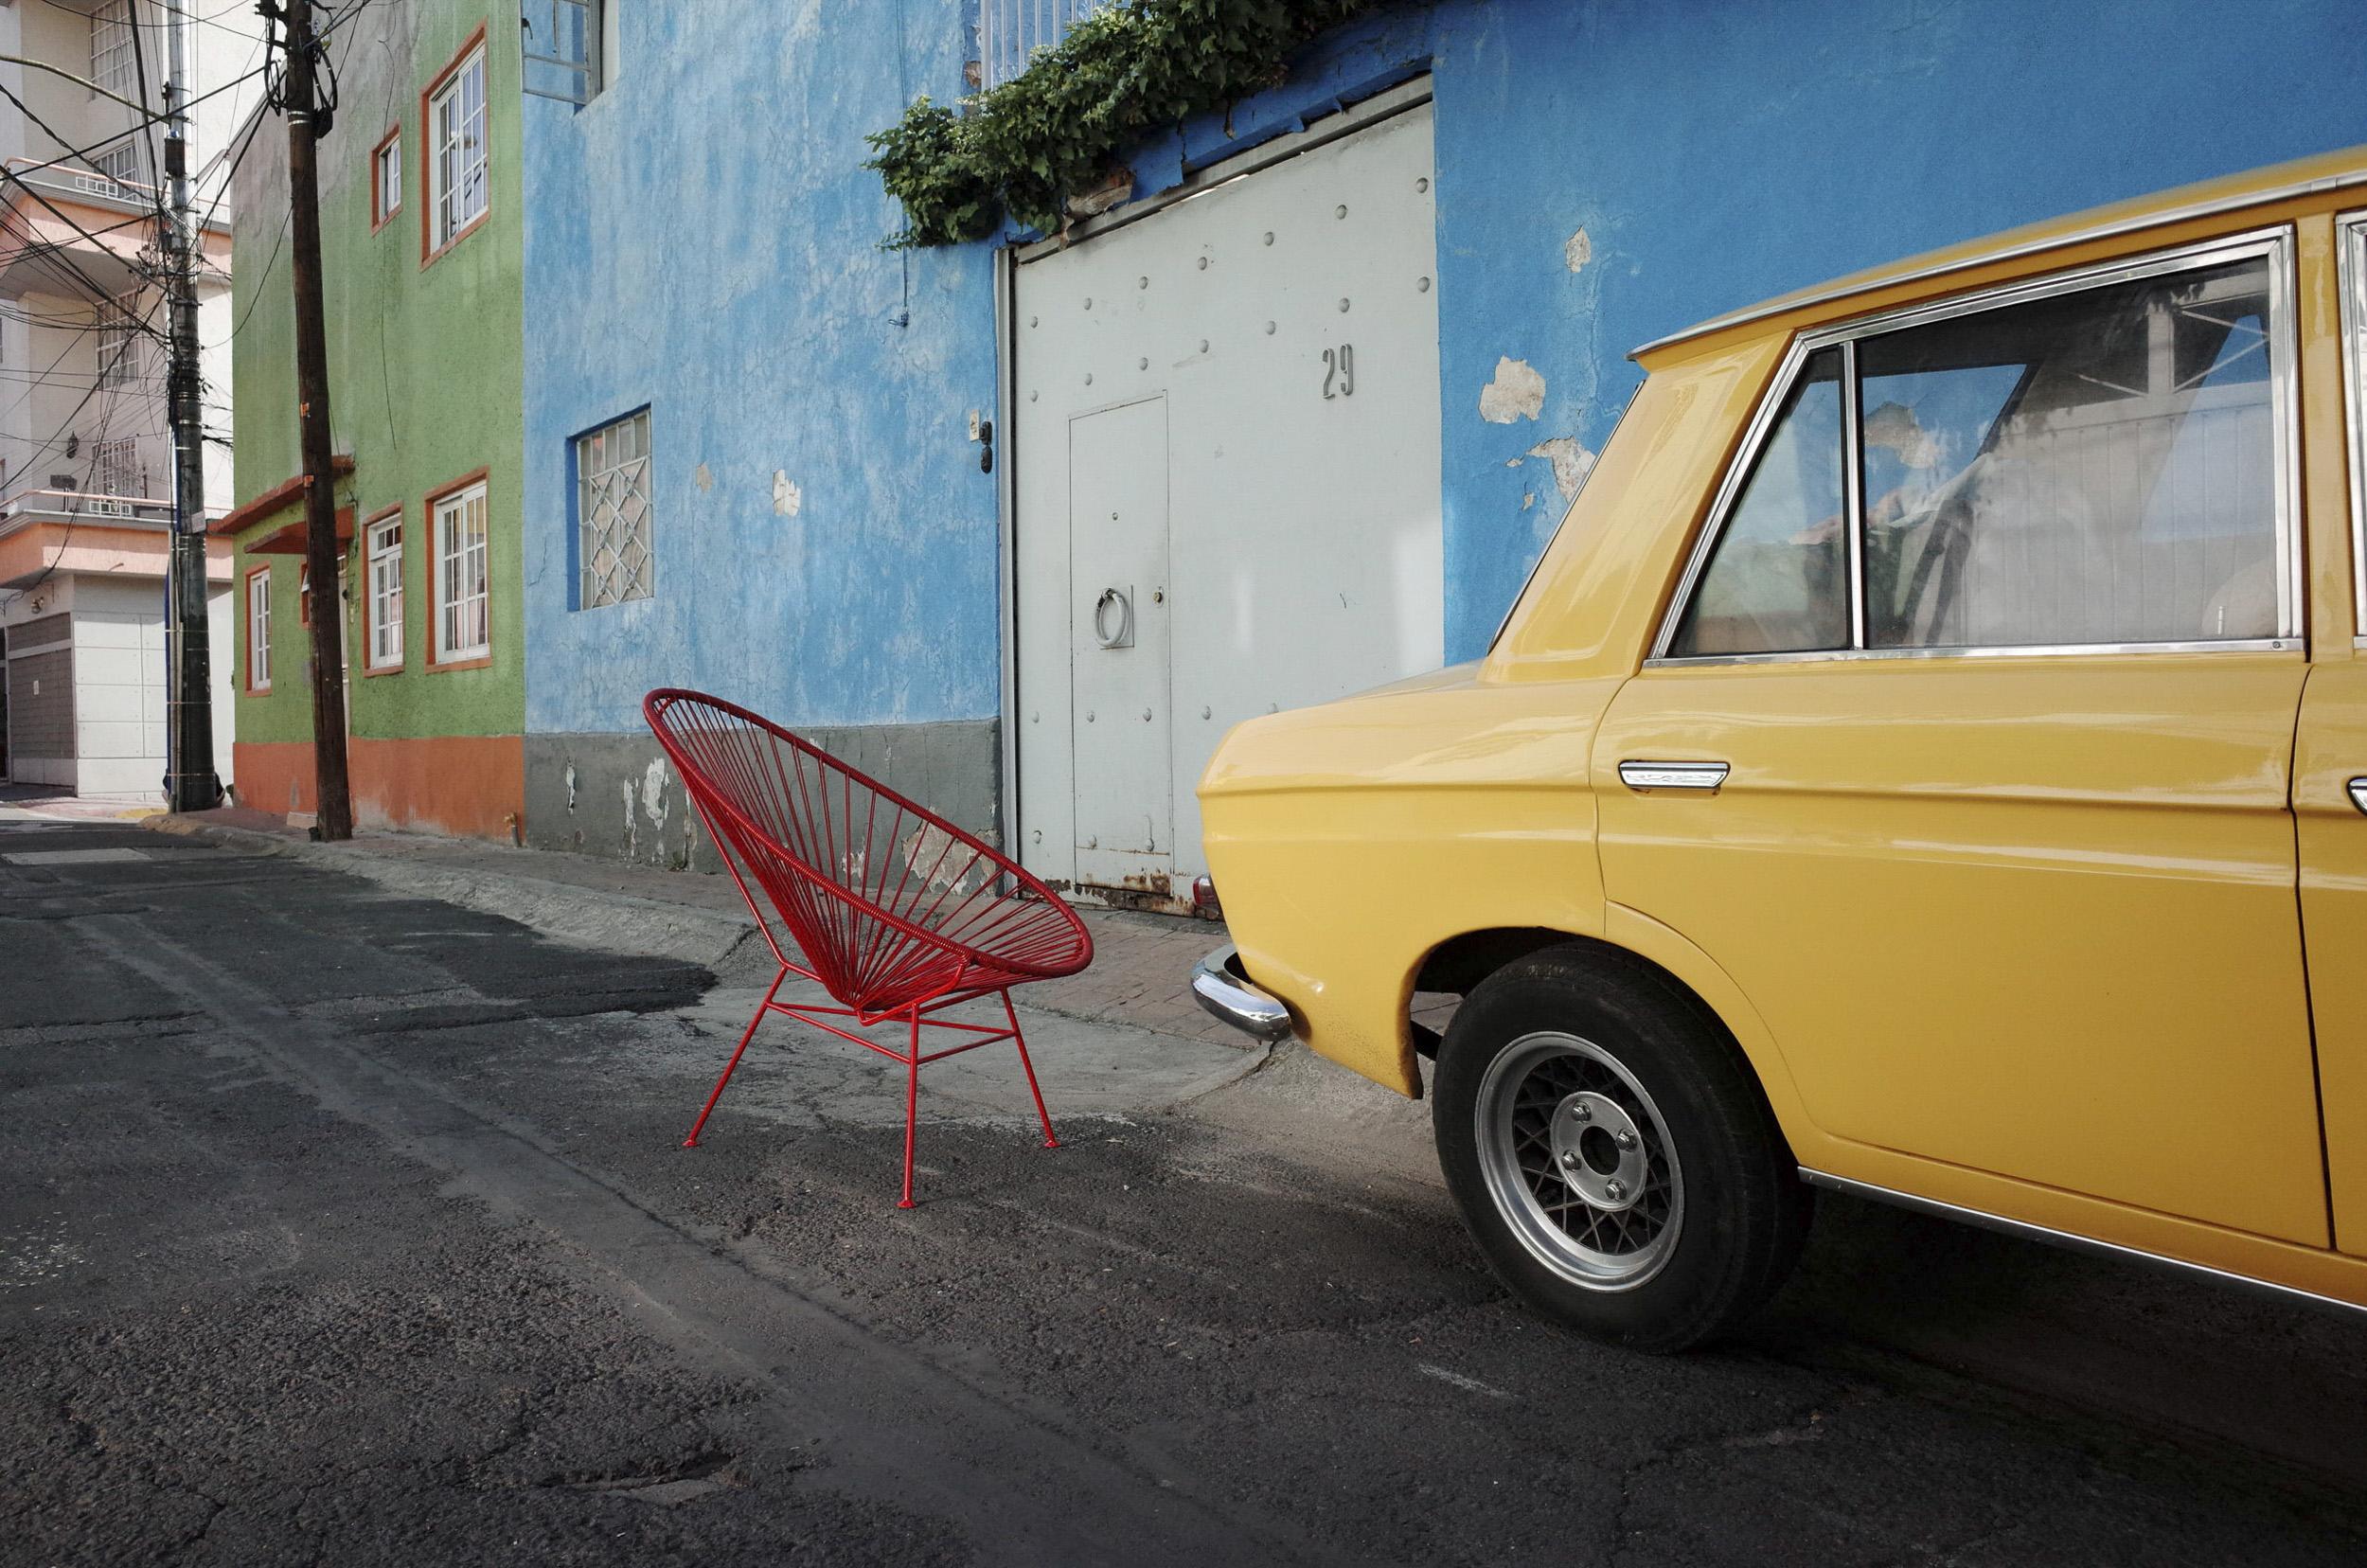 Work My Playa Photographer Business Photgraphy Blog Acapulco Design023.jpg